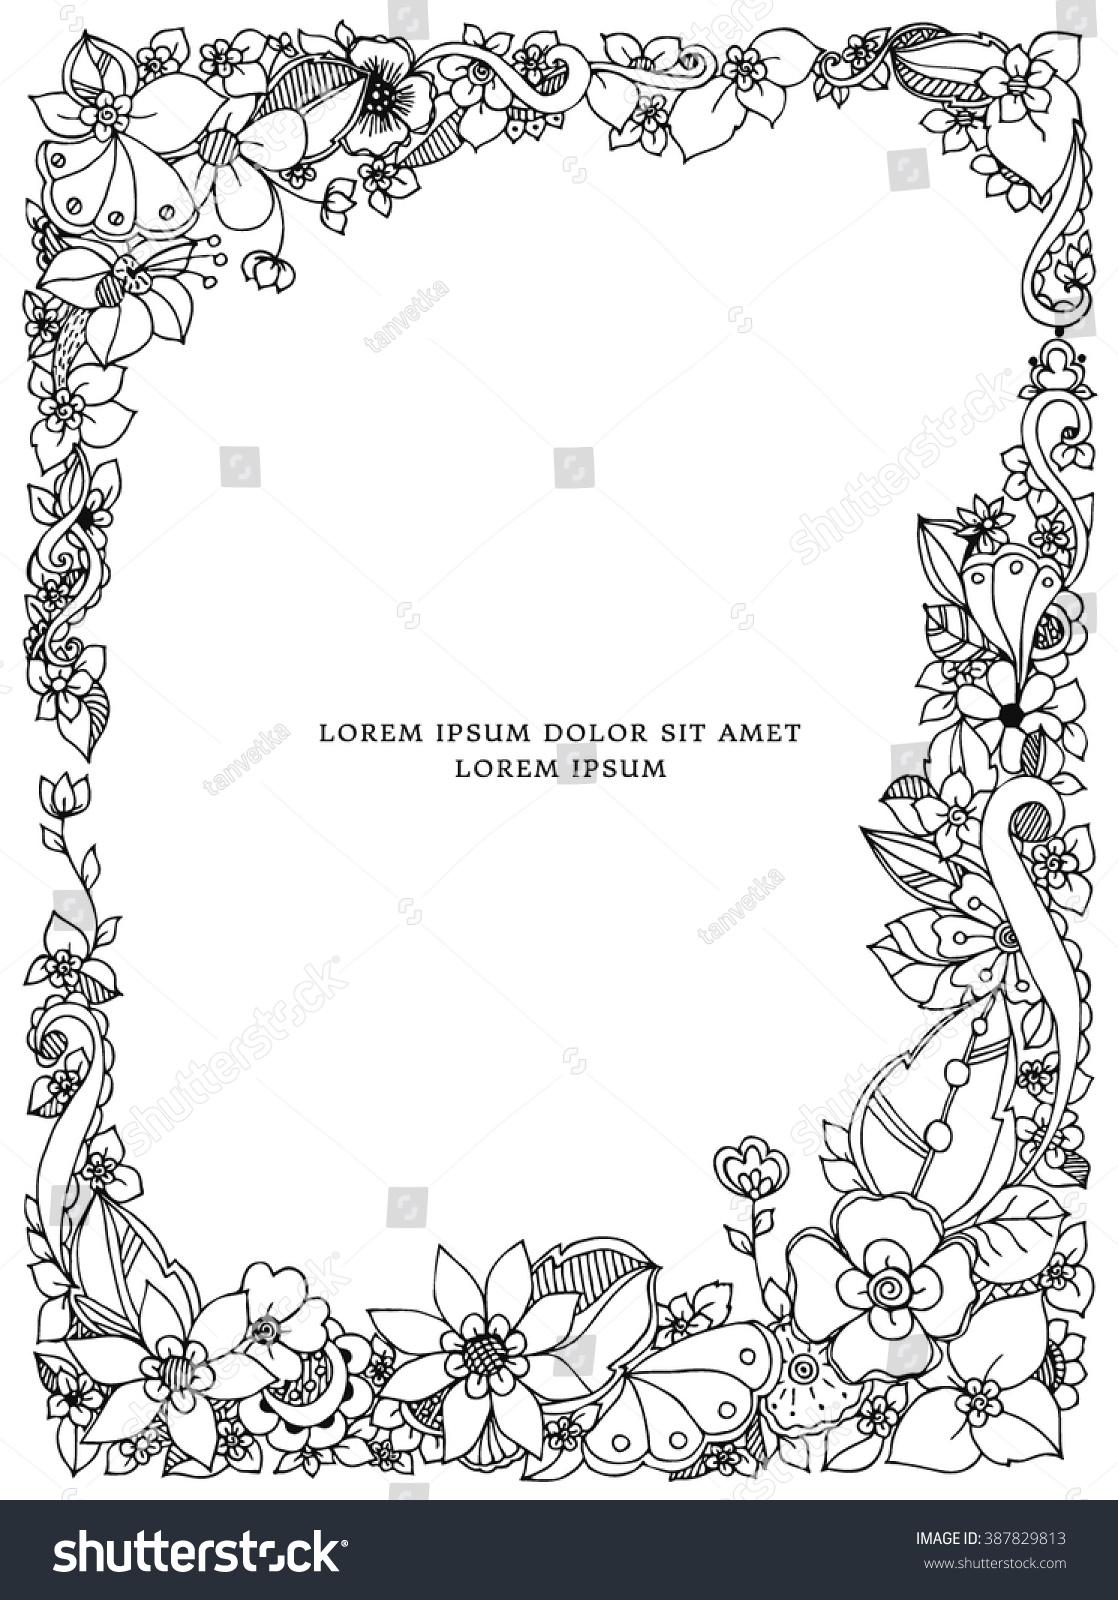 Vetor Stock De Ilustracao Vetorial De Moldura Floral Zentangle